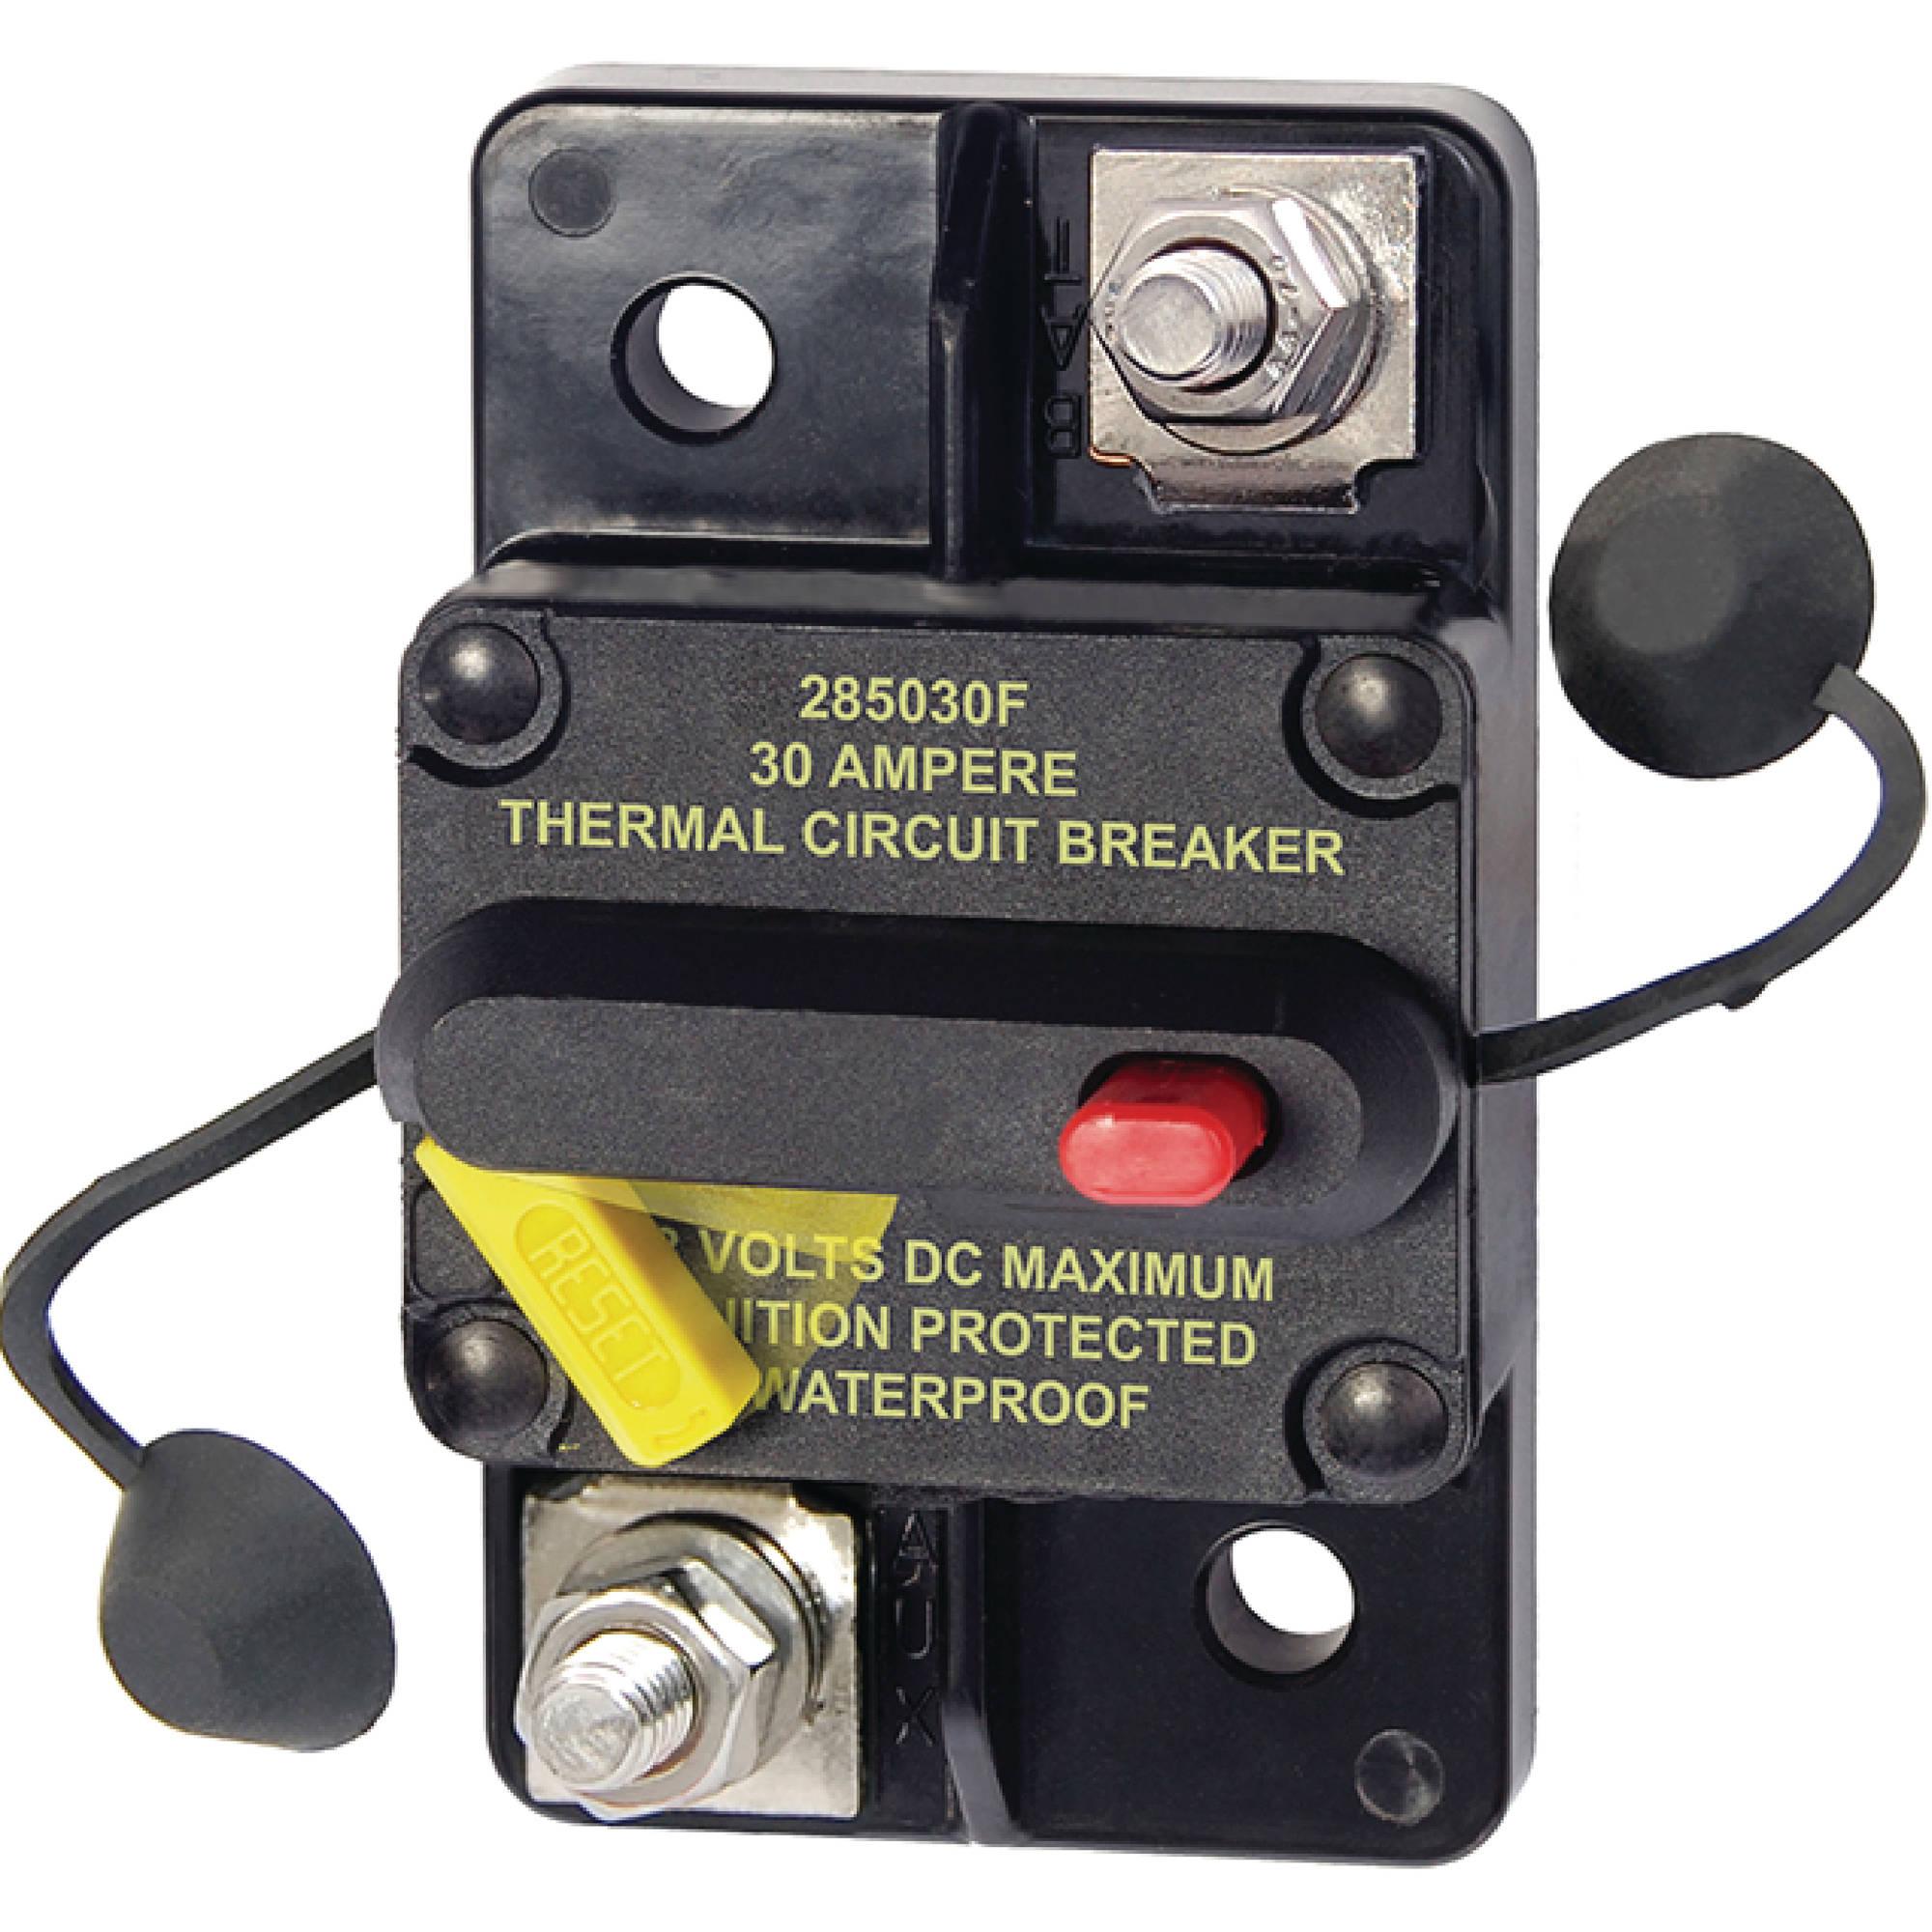 Buss 185050F Waterproof 50 Amp Boat Thermal Circuit Breaker